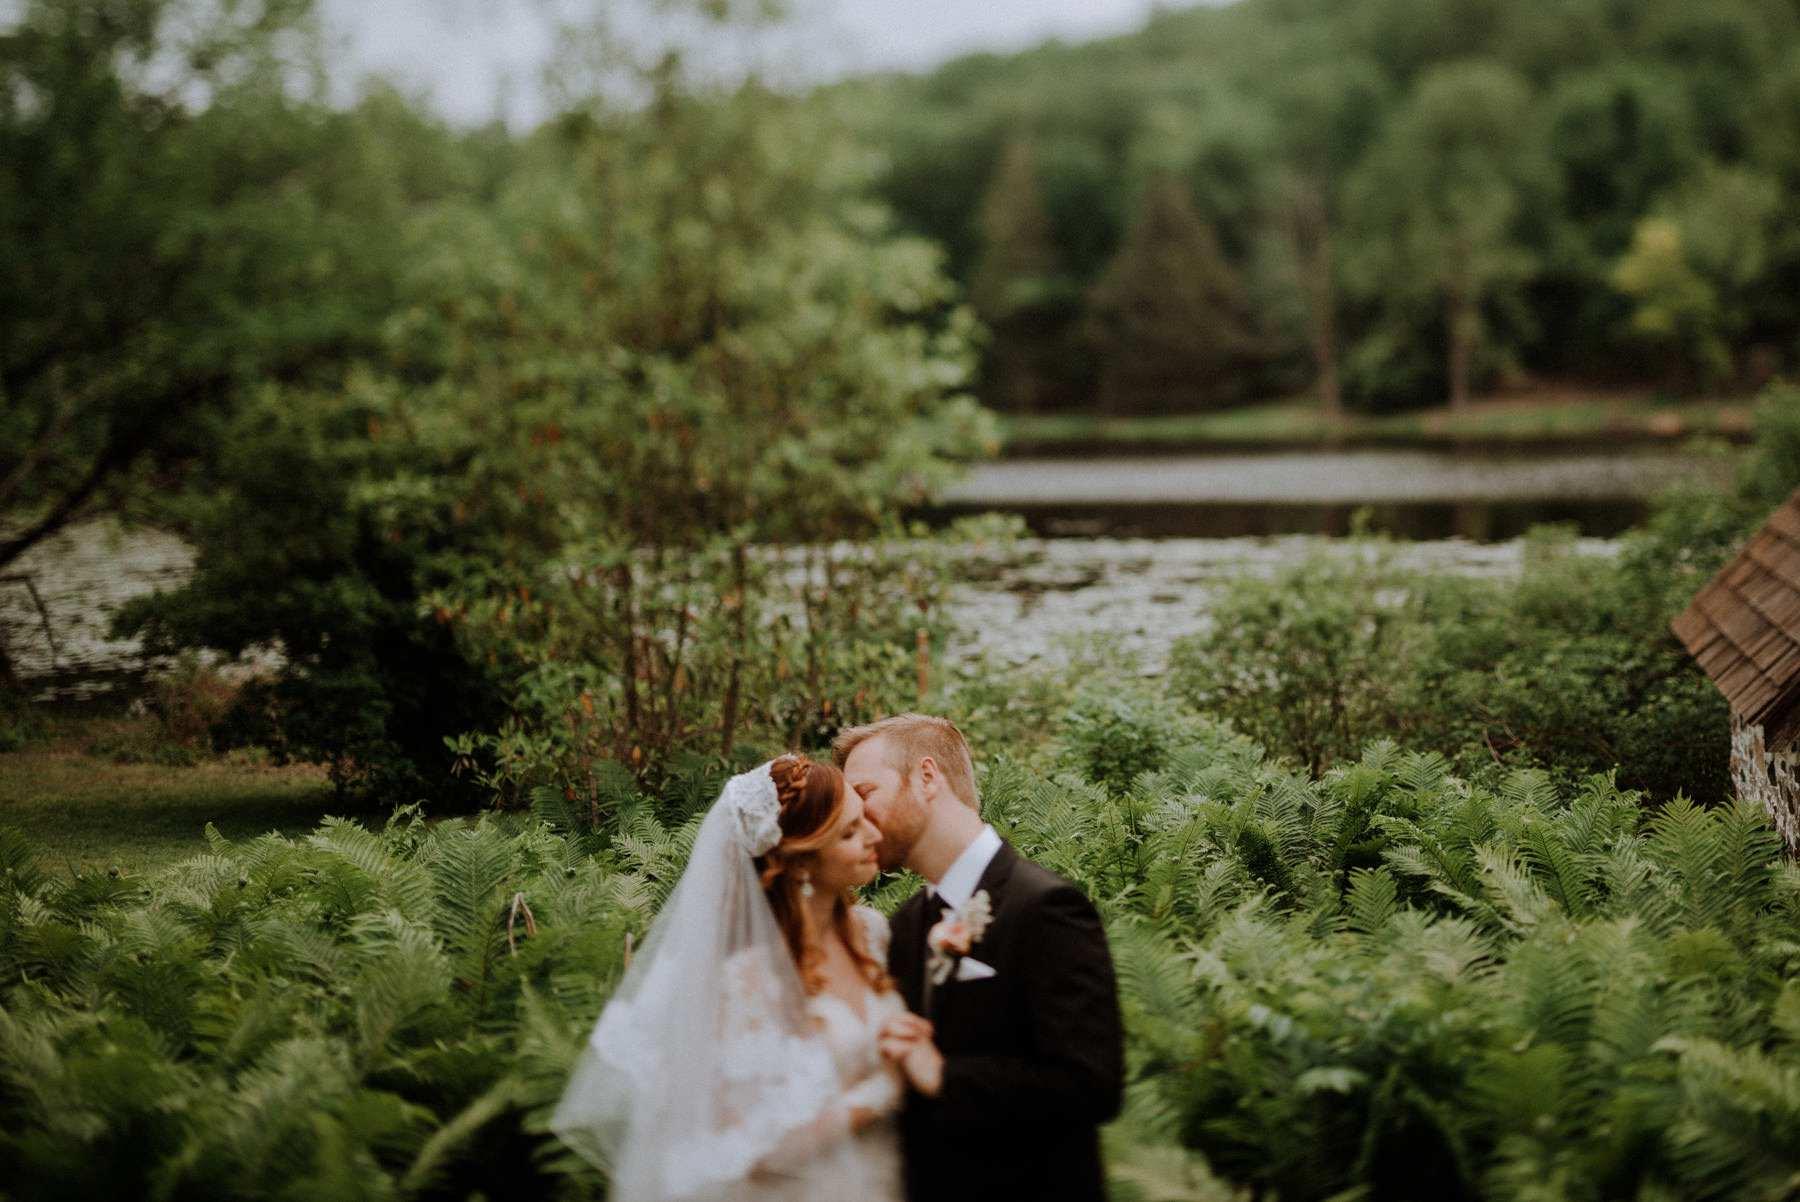 welkinweir-wedding-photography-20.jpg